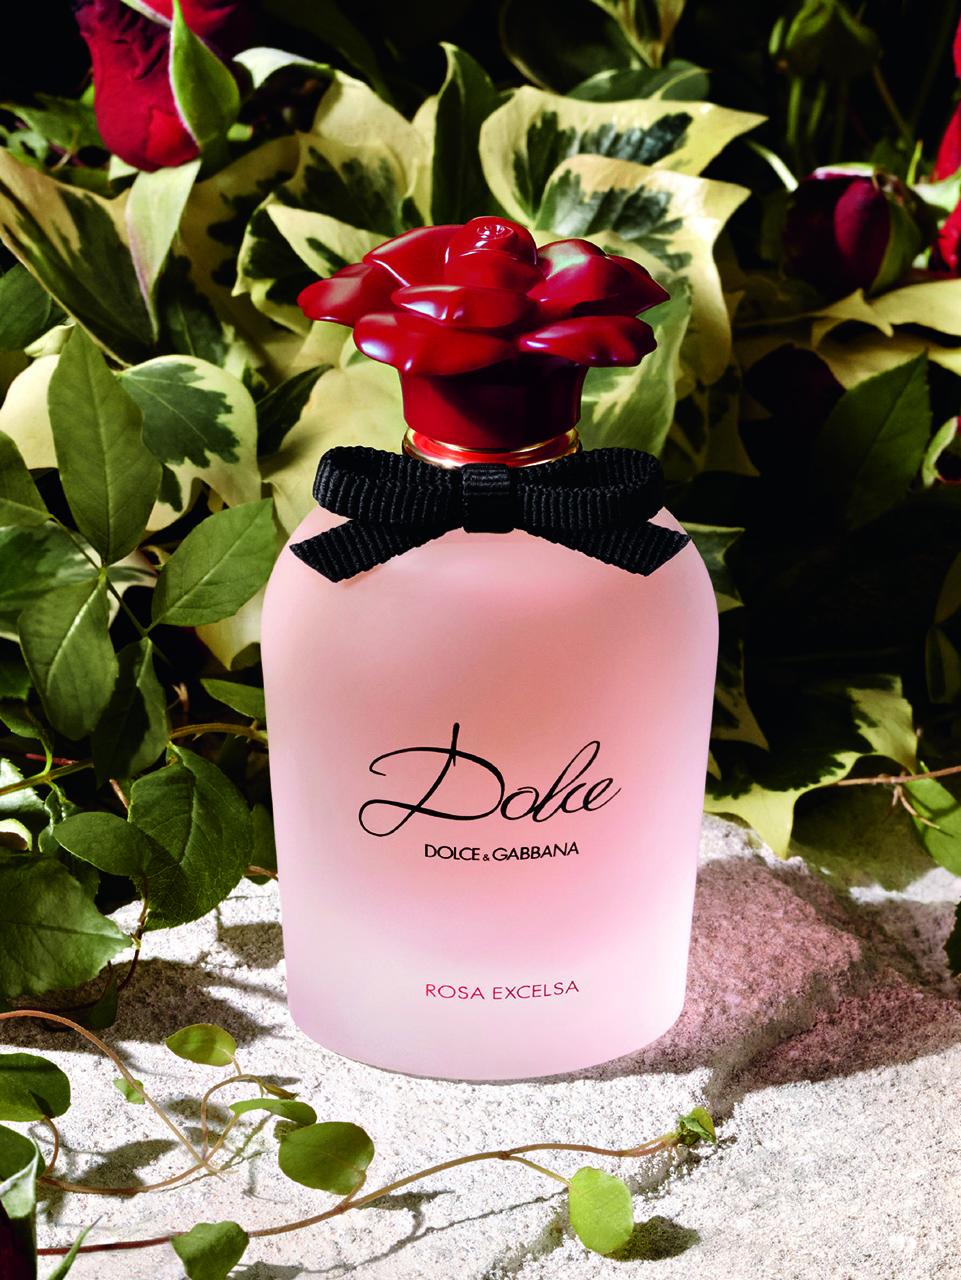 Dolce Gabbana Dolce Rosa Excelsa Yeni Parfümü